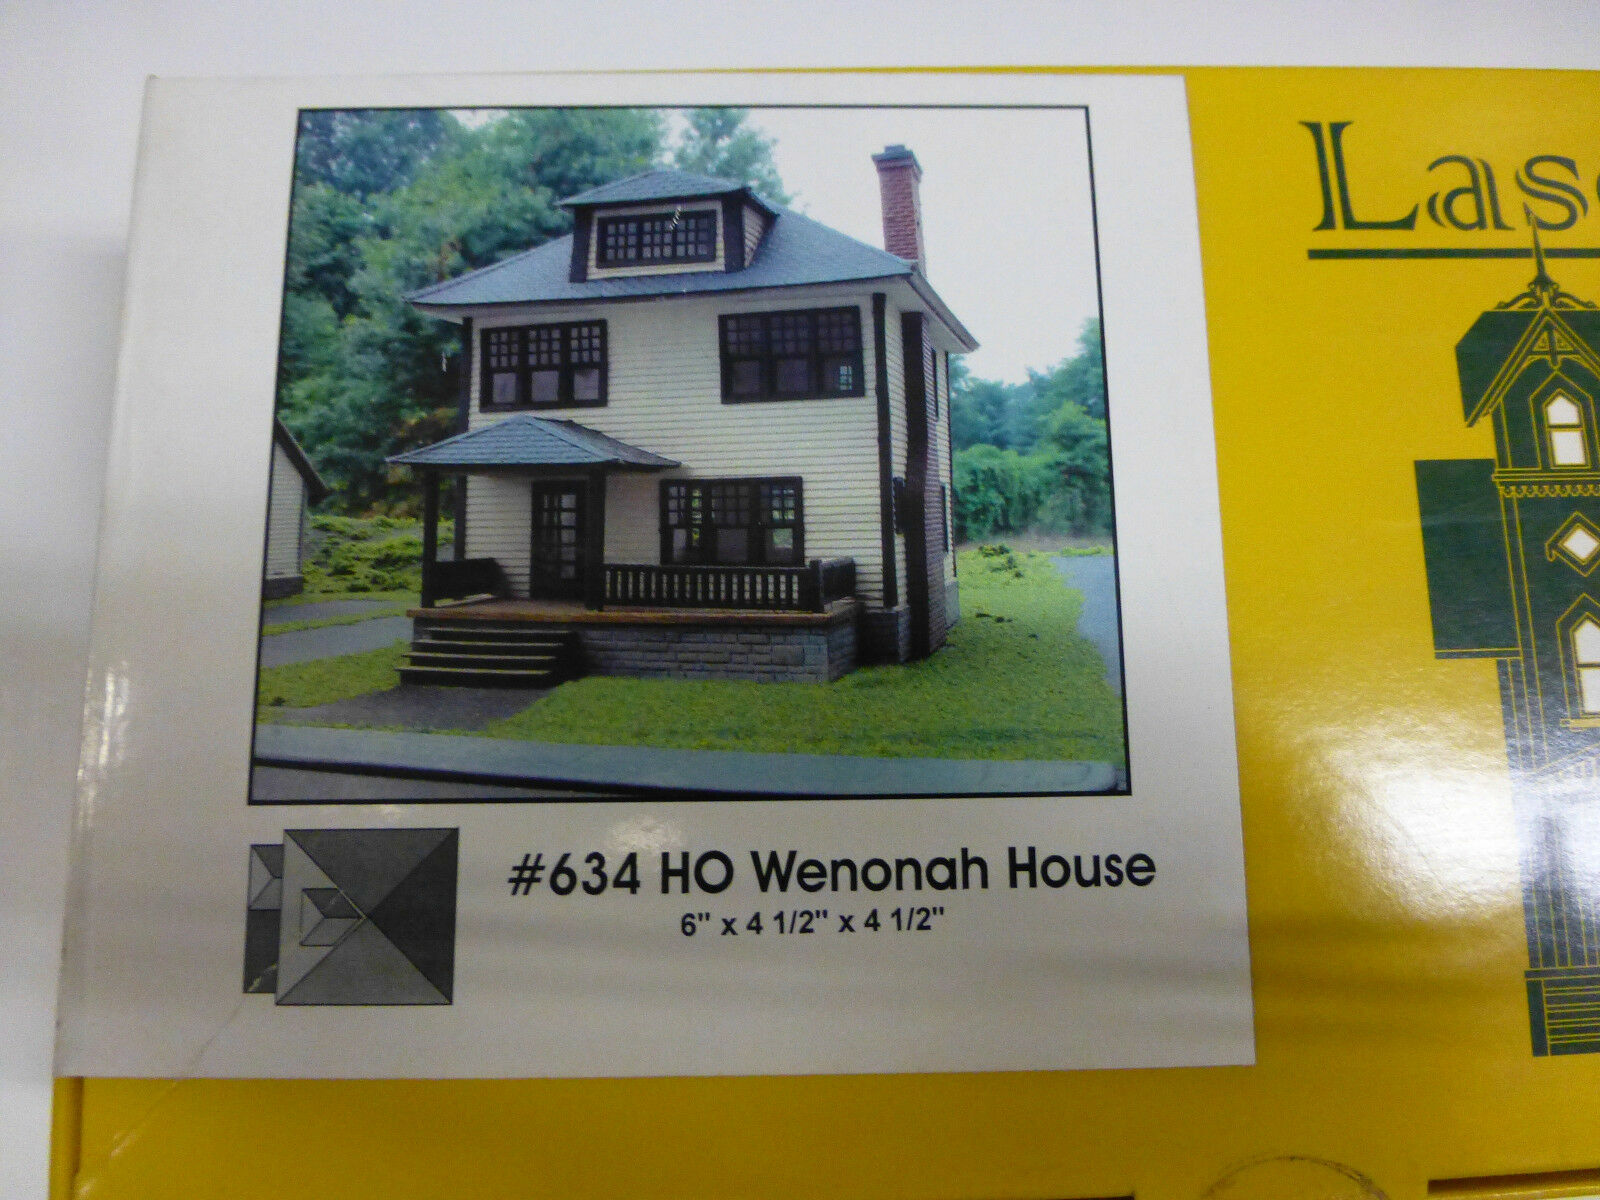 Branchline Laser-Art Structures HO The Wenonah House